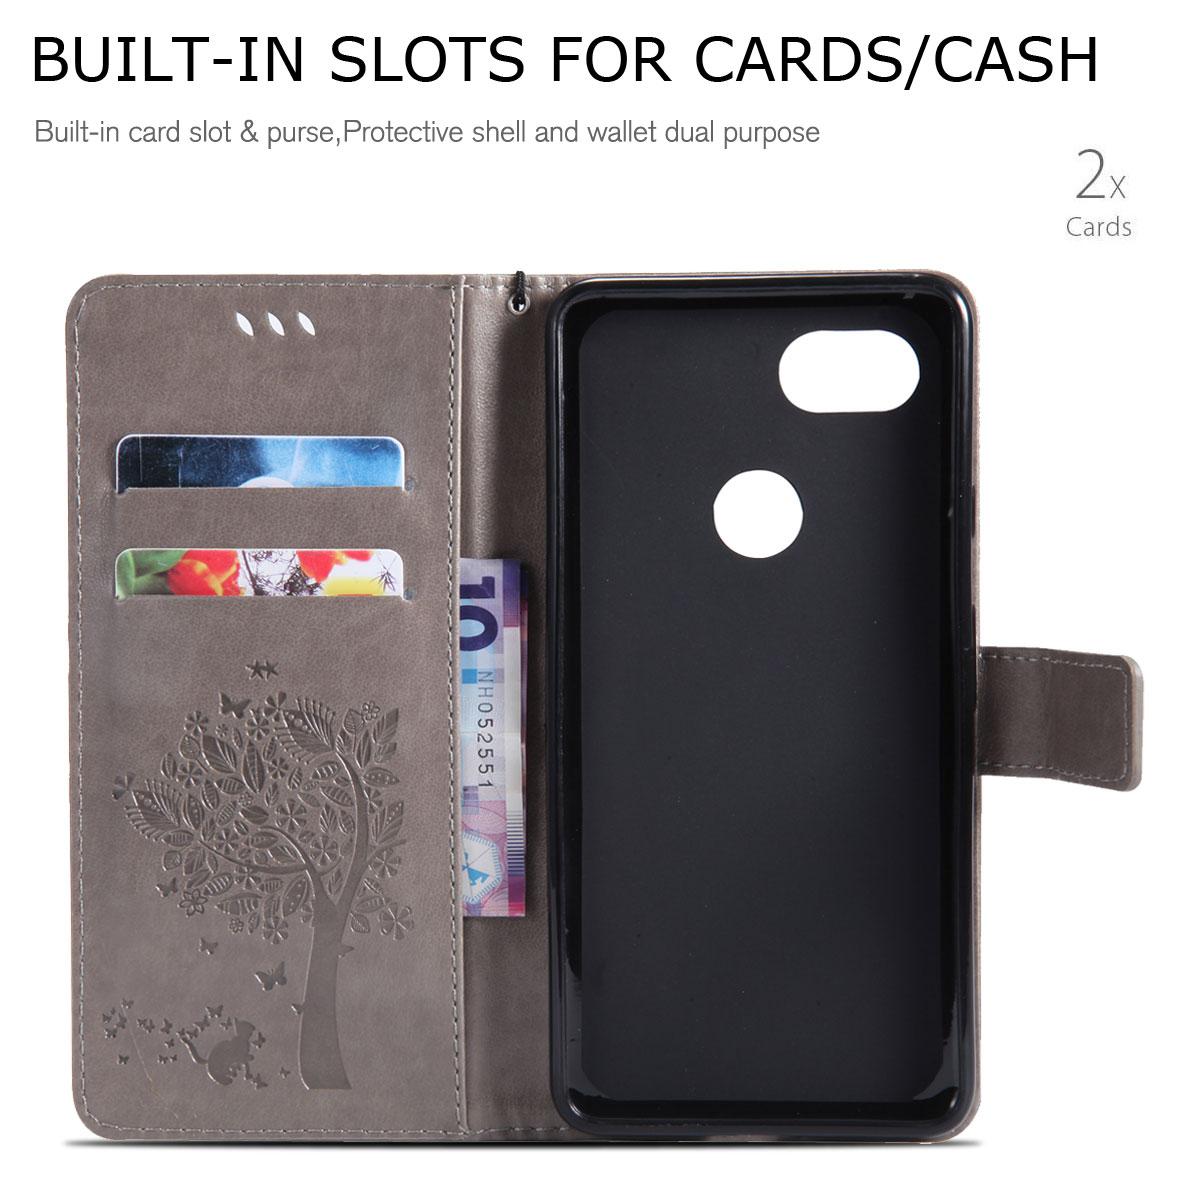 Magnetic-Leather-Credit-Card-Holder-Flip-Case-Cover-For-Google-Pixel-2-2-XL thumbnail 34